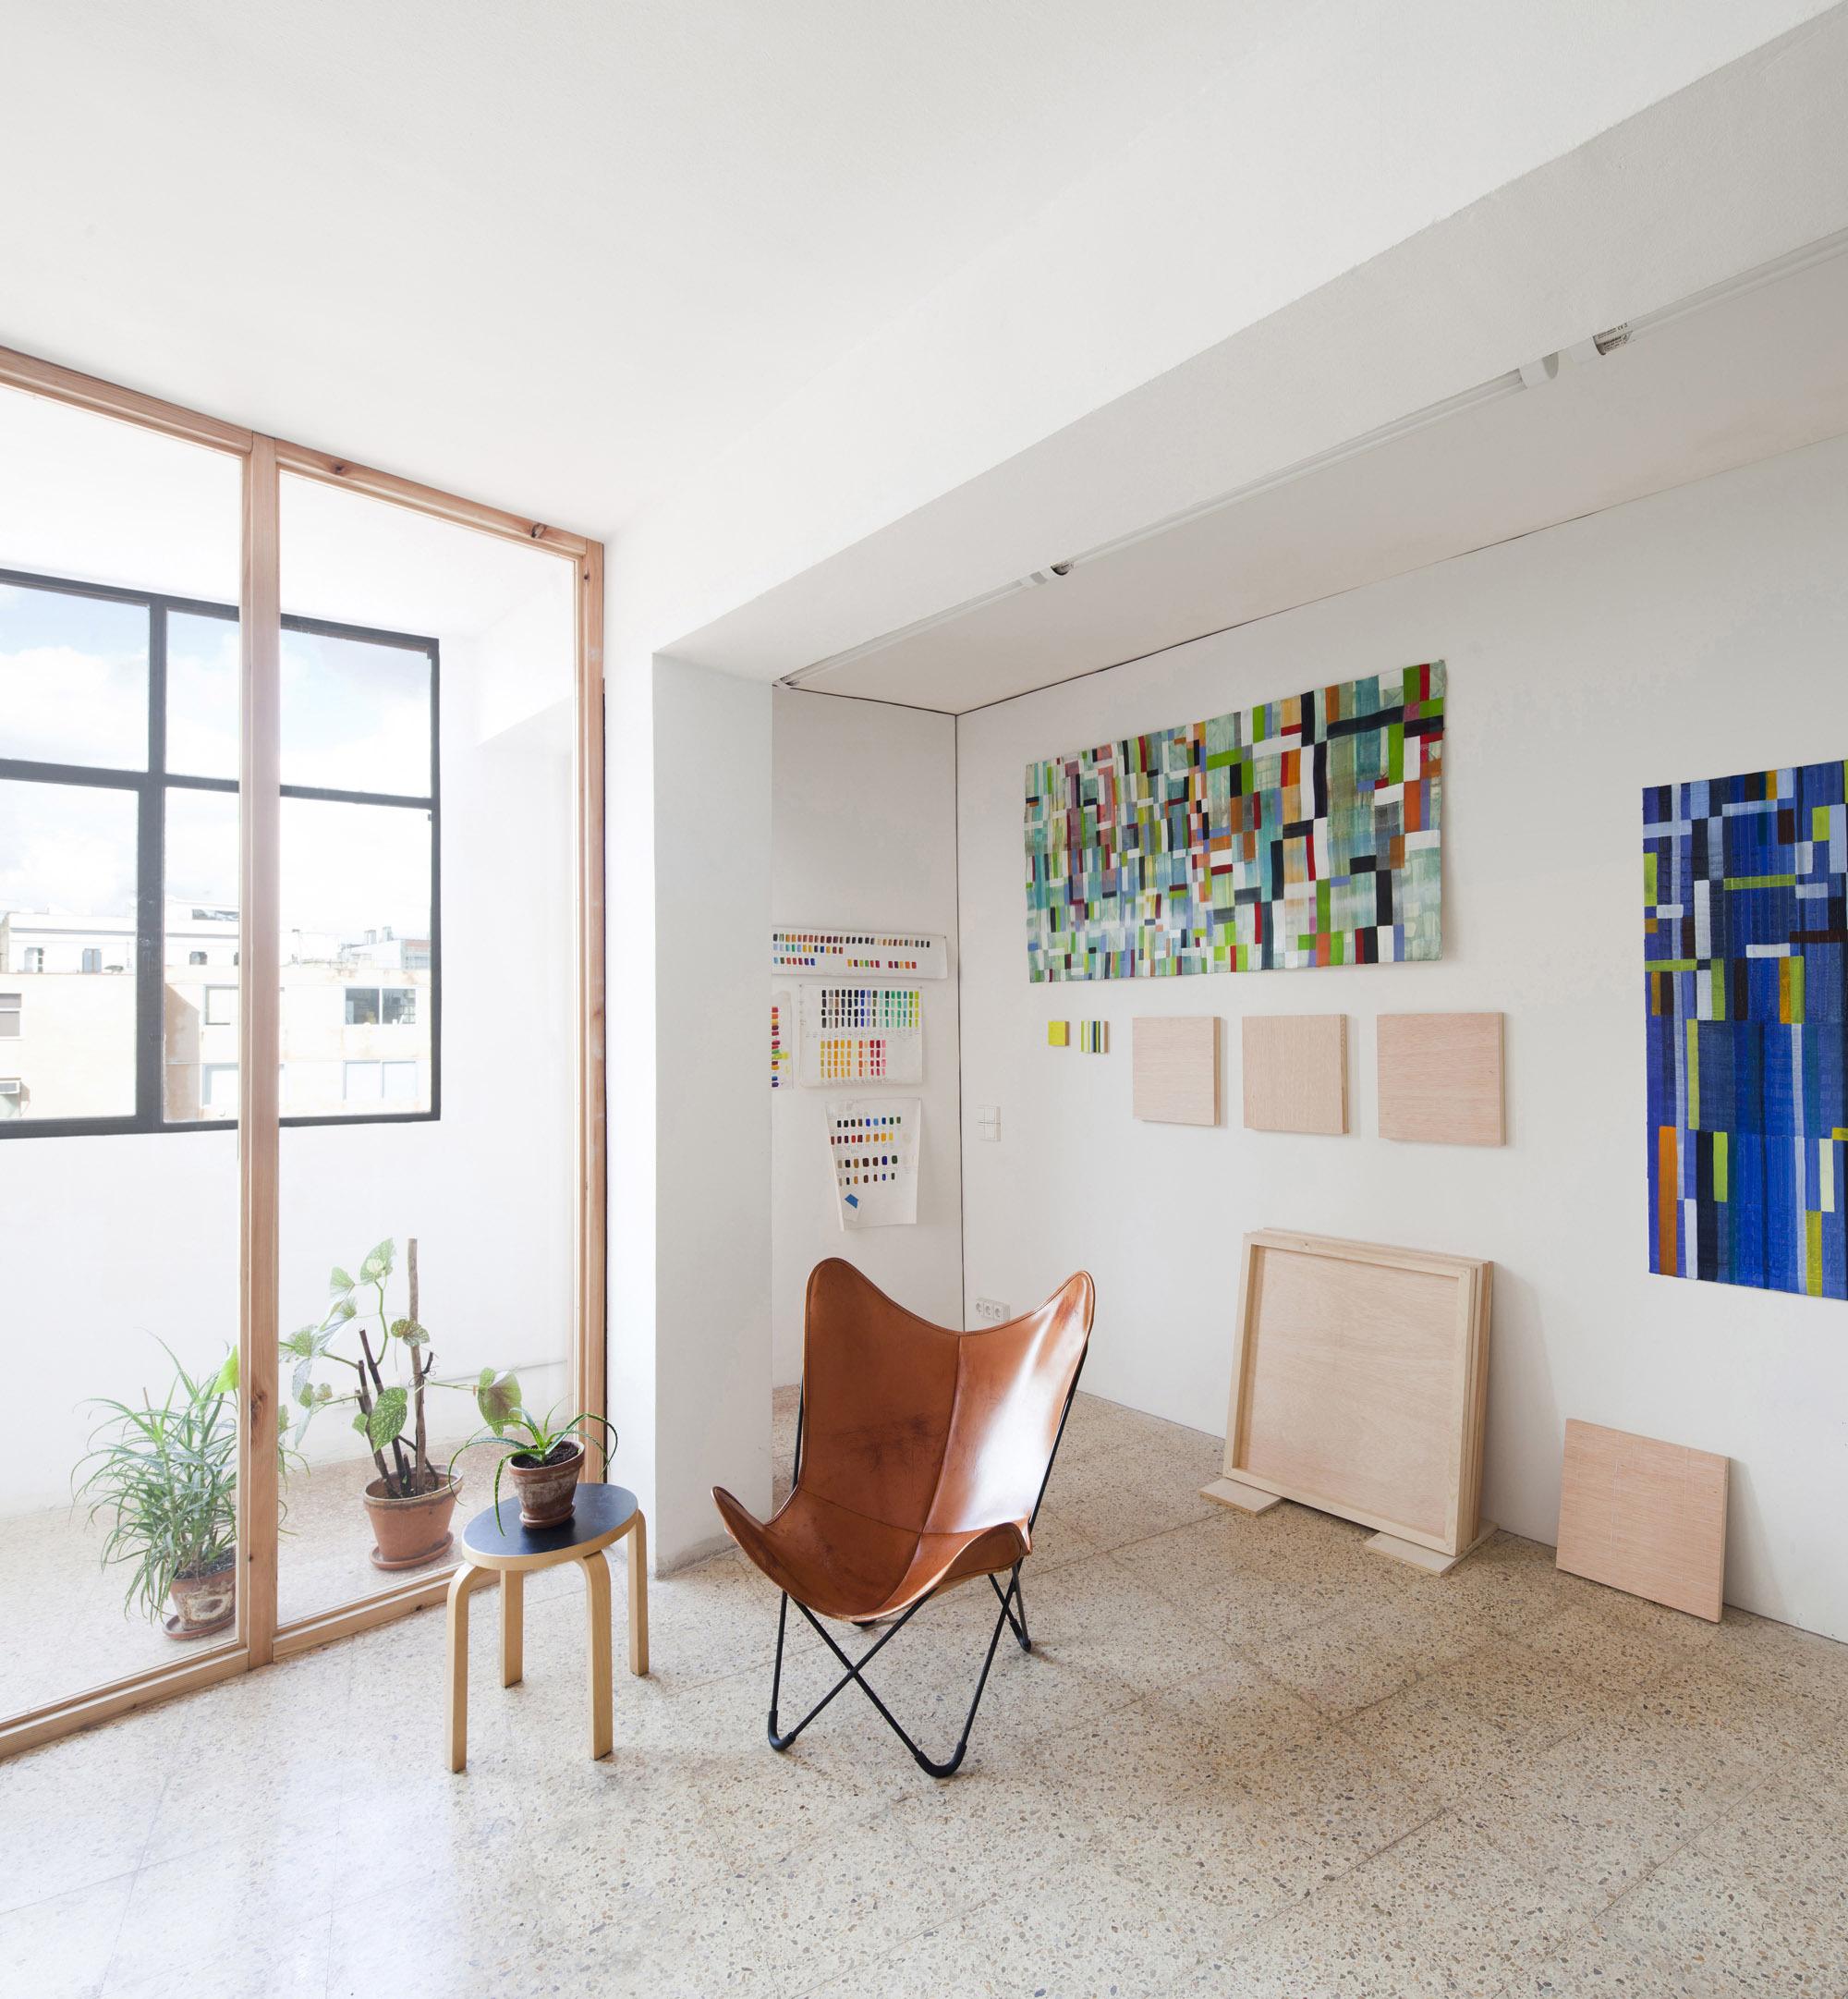 Studio for Artist Victor Pérez-Porro / Anna & Eugeni Bach